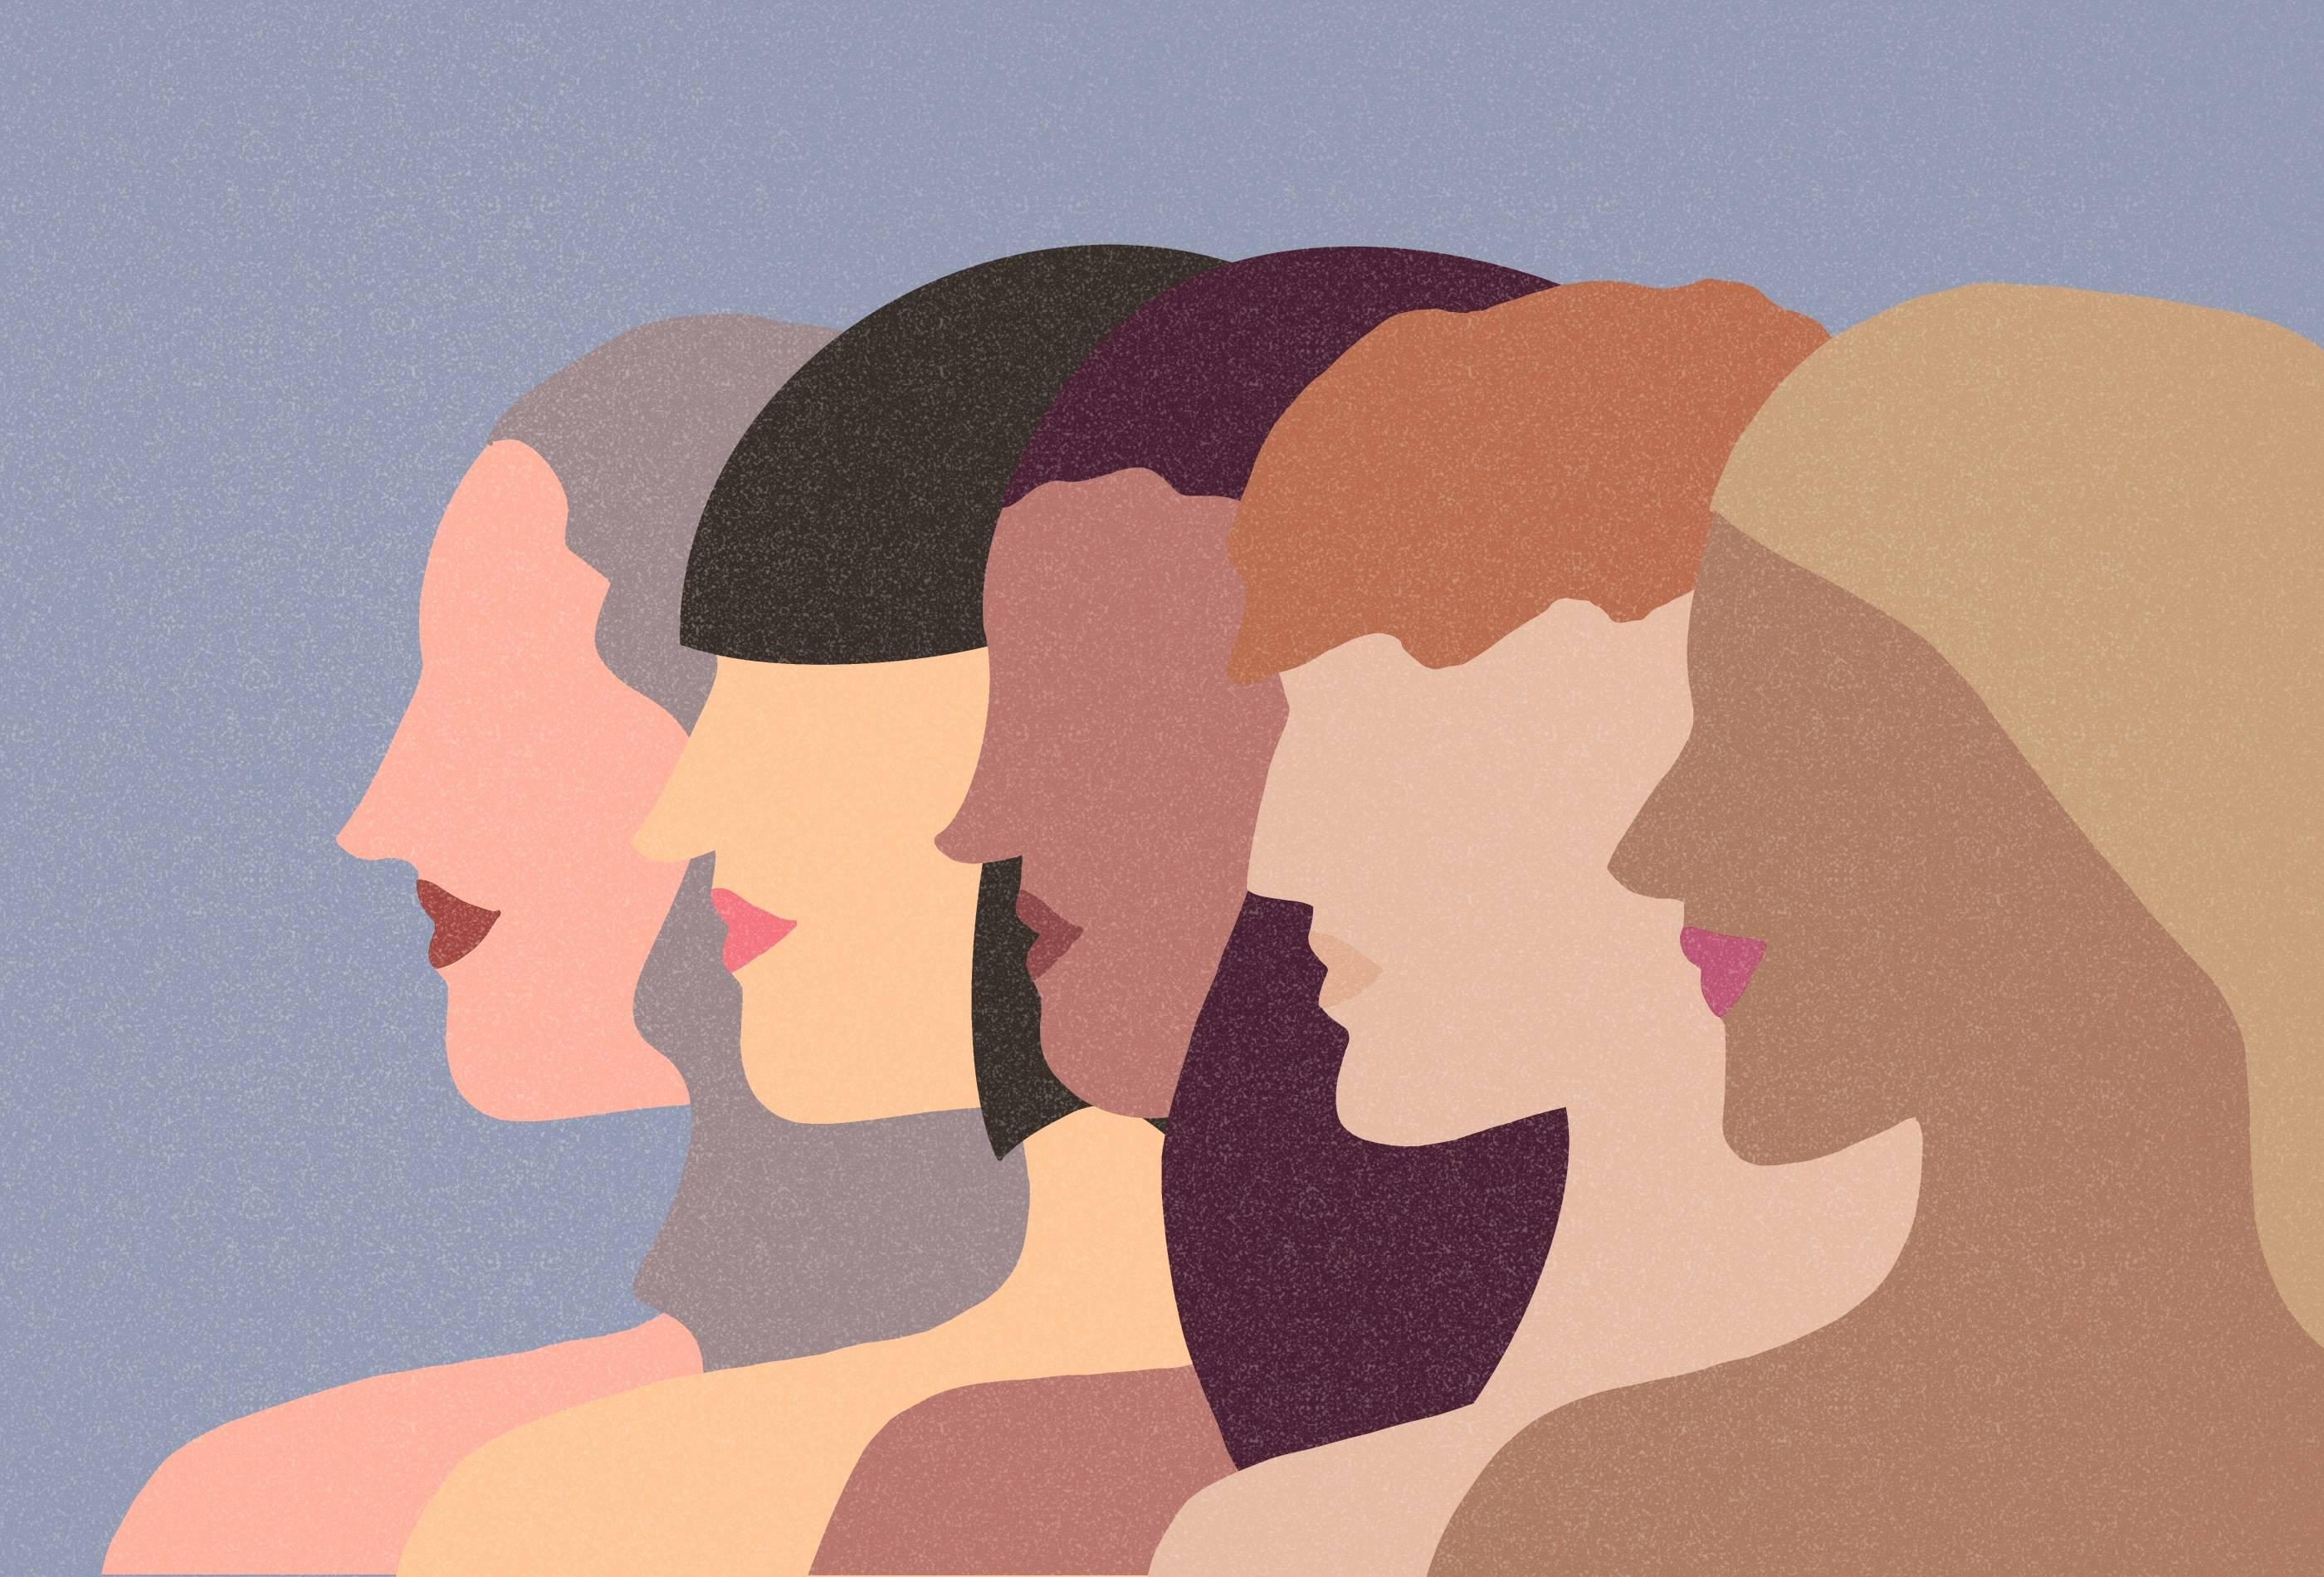 www.juicysantos.com.br - mandato coletivo feminino